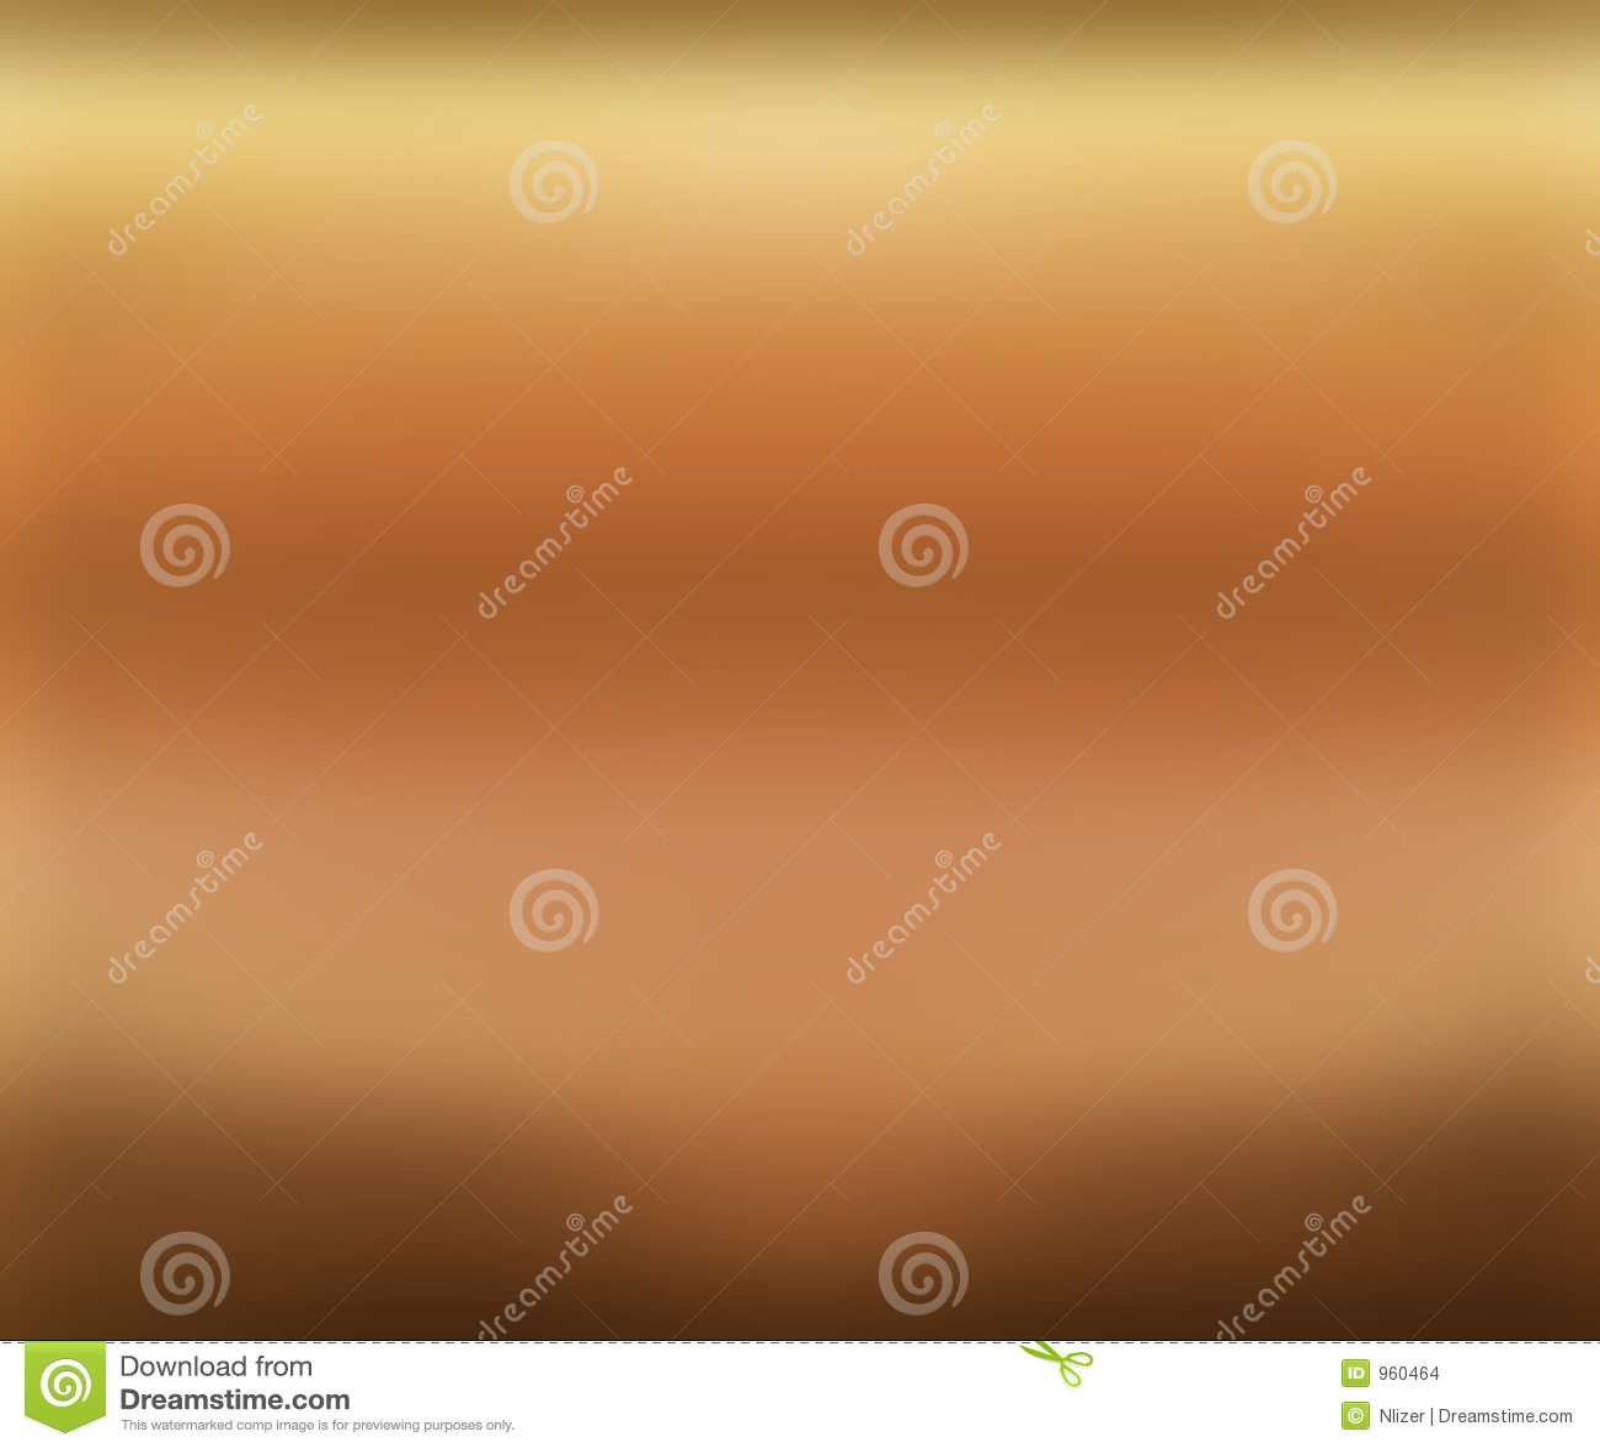 Copper Plate wallpaper background